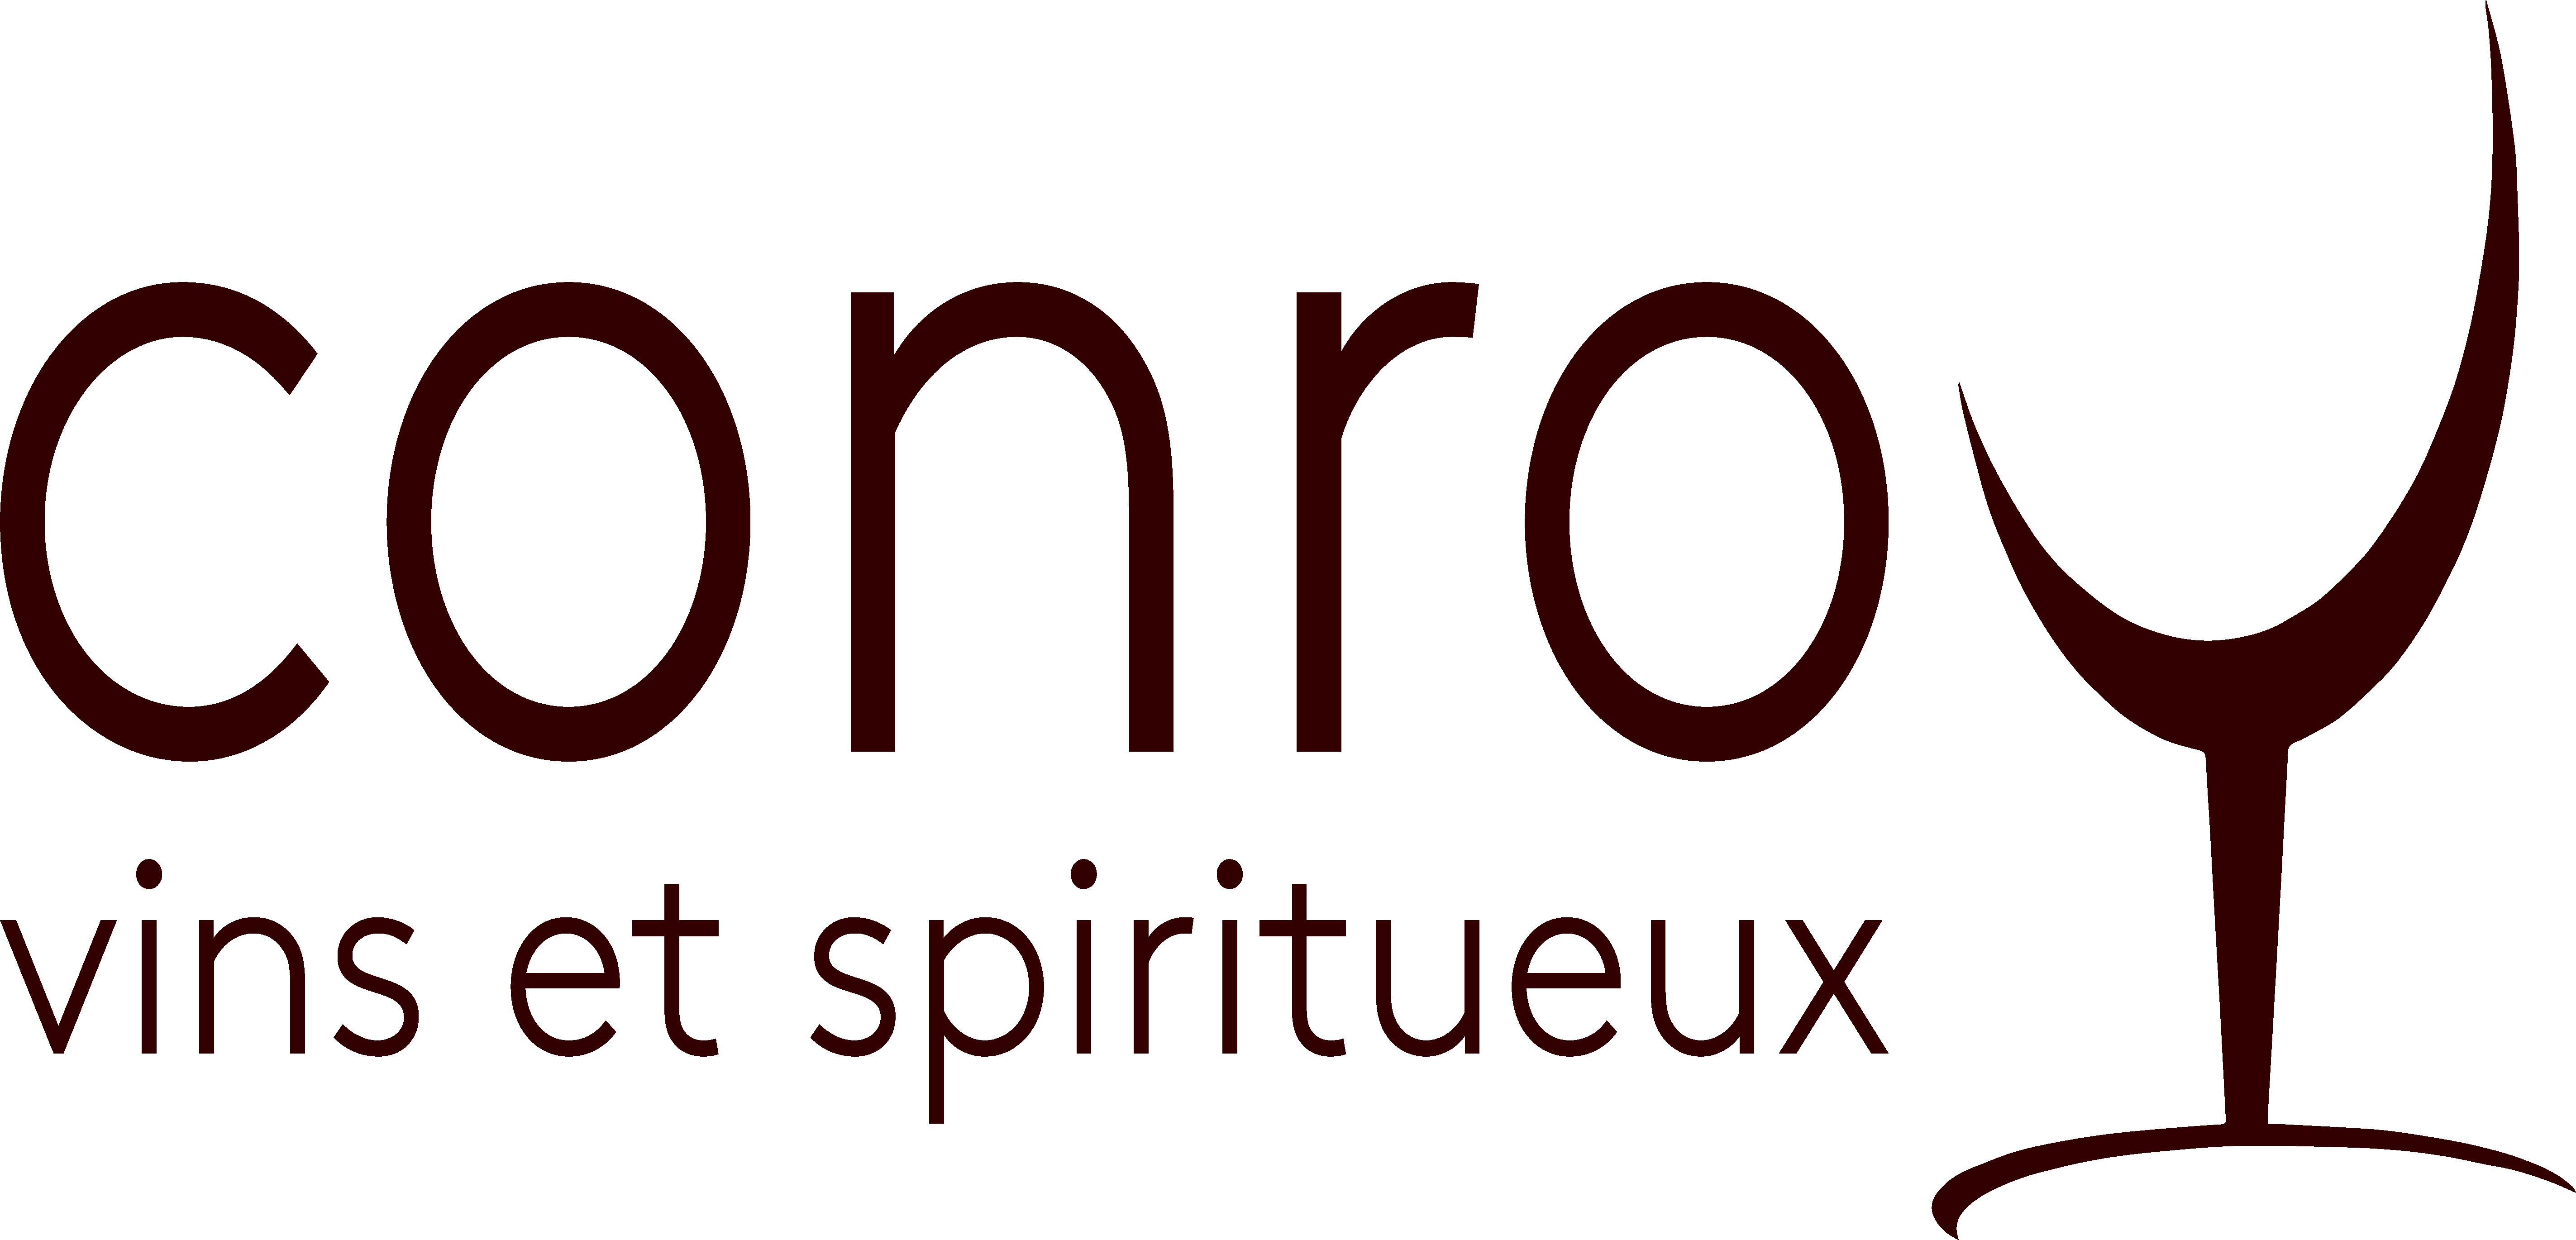 Conroy - Vins et spiritueux